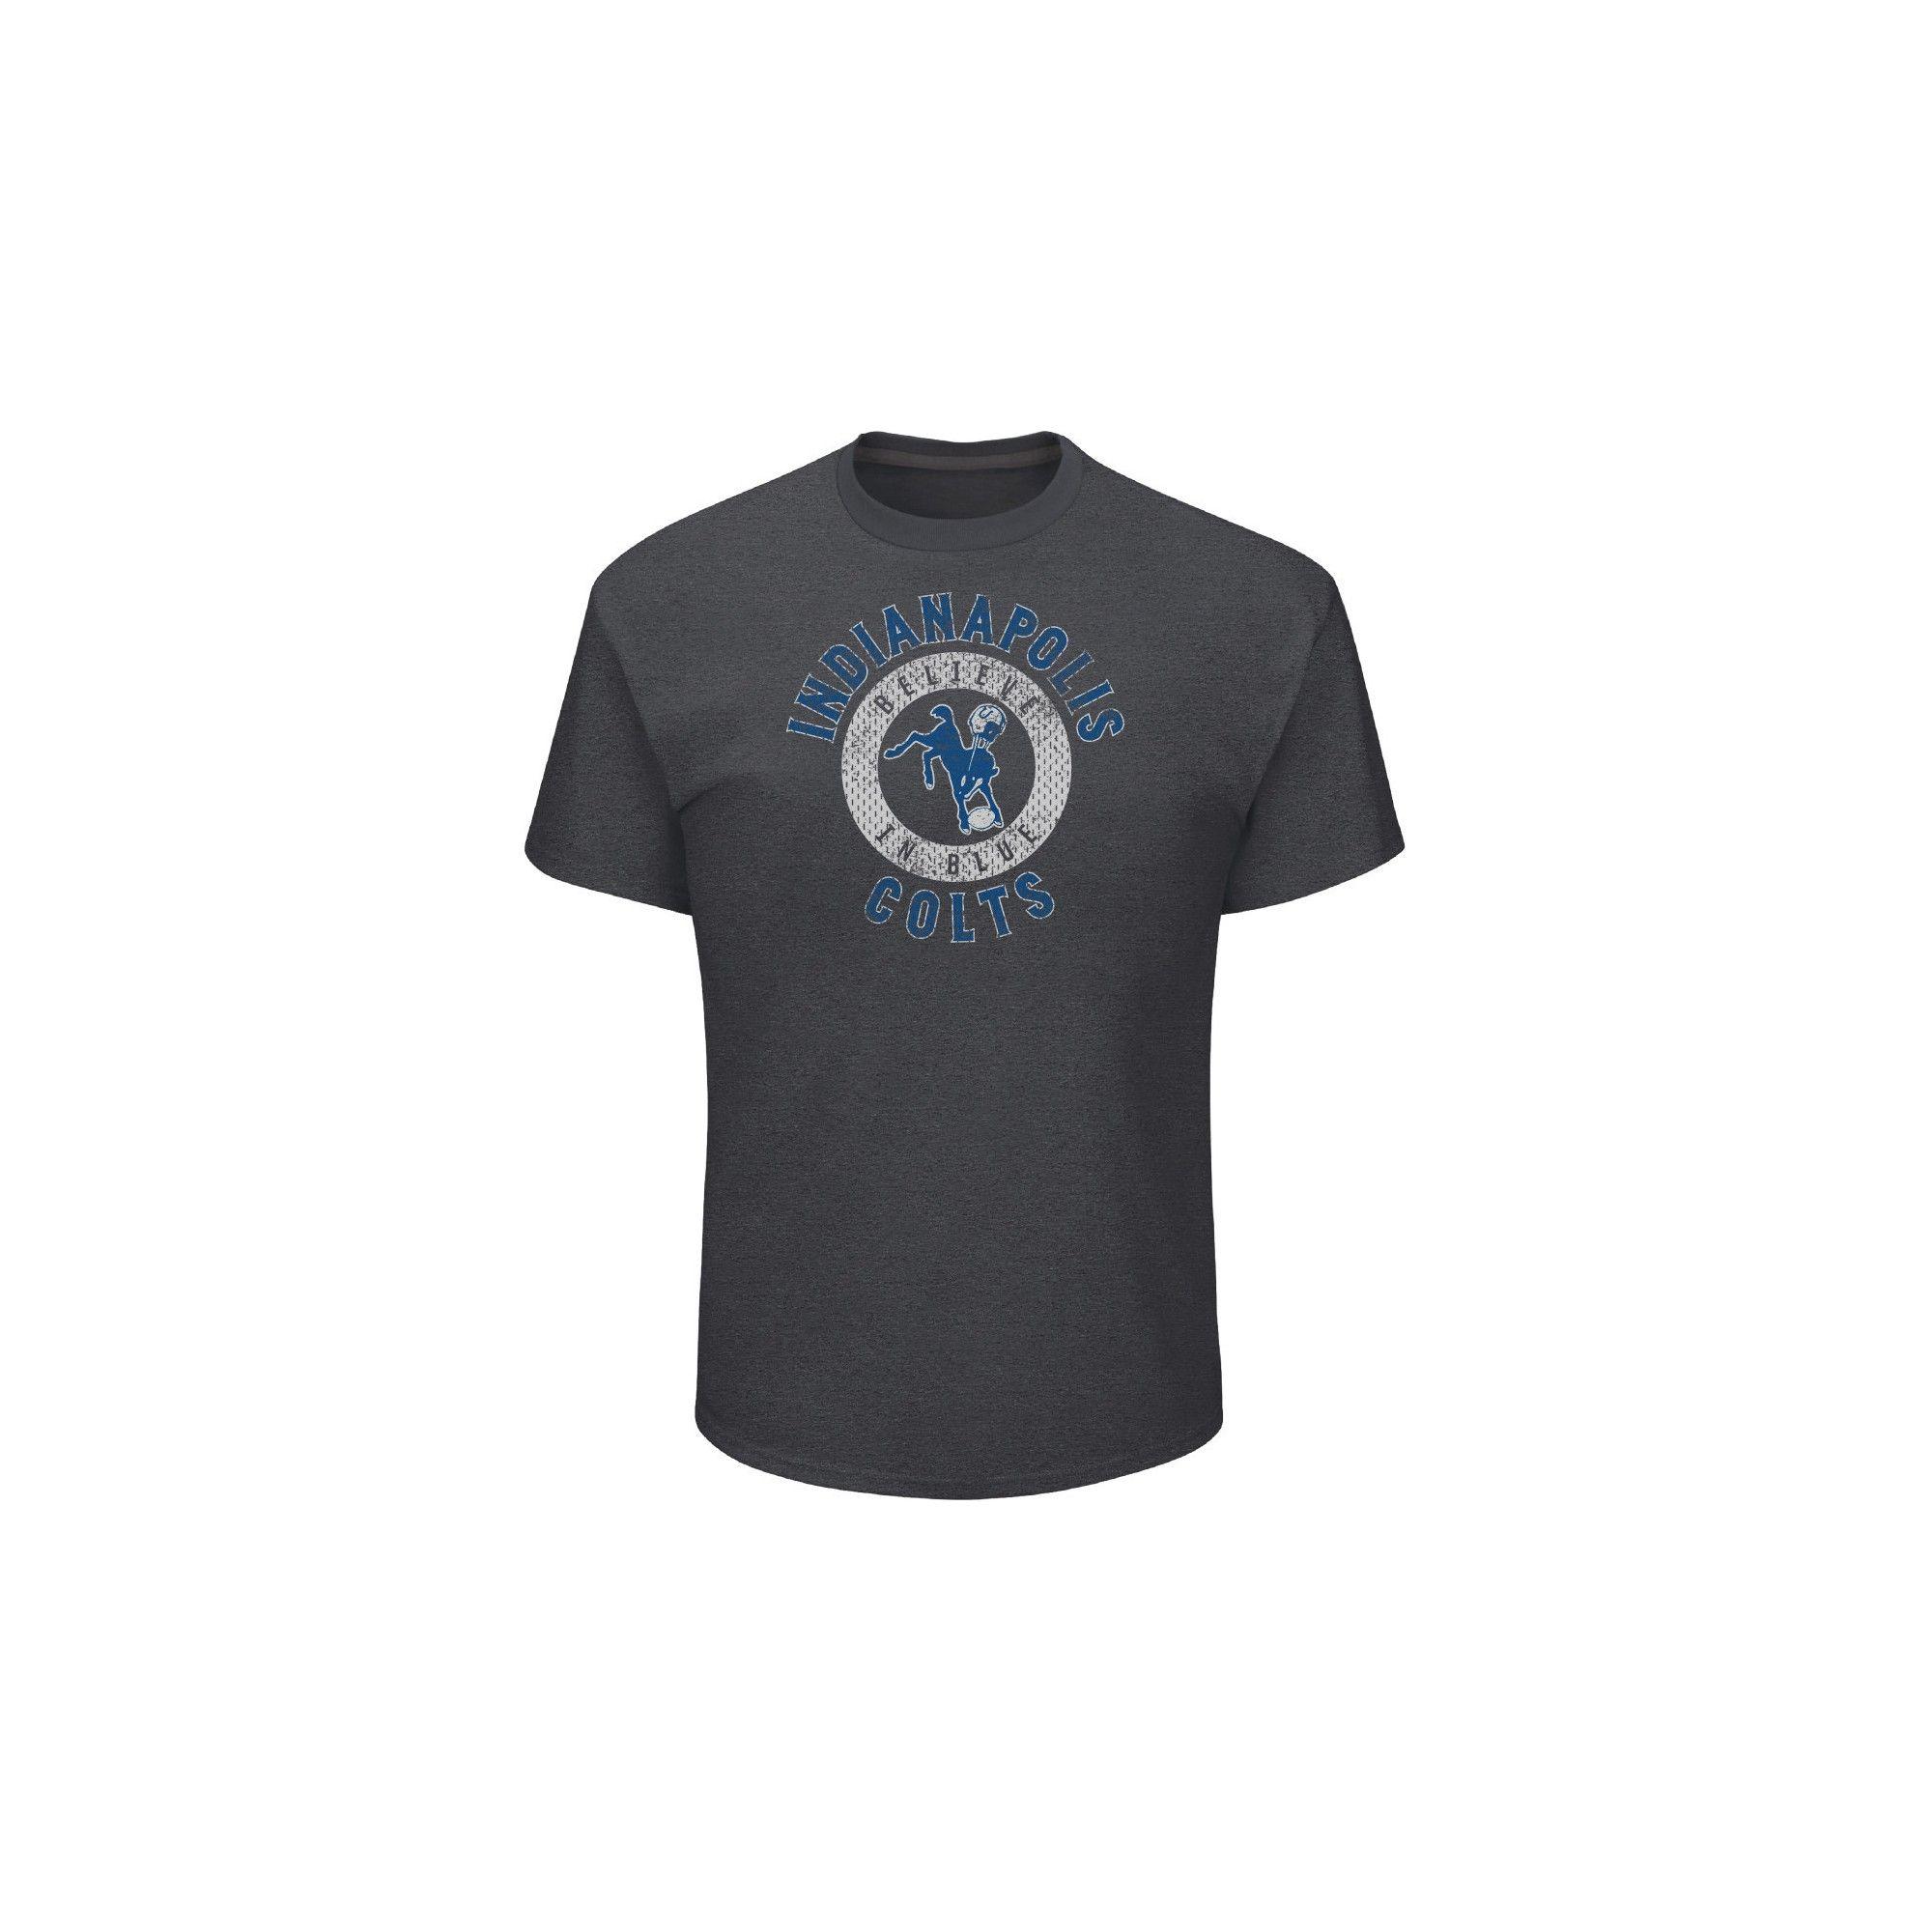 d8e2e419 Indianapolis Colts Men's Startling Success Gray Soft Touch T-Shirt ...